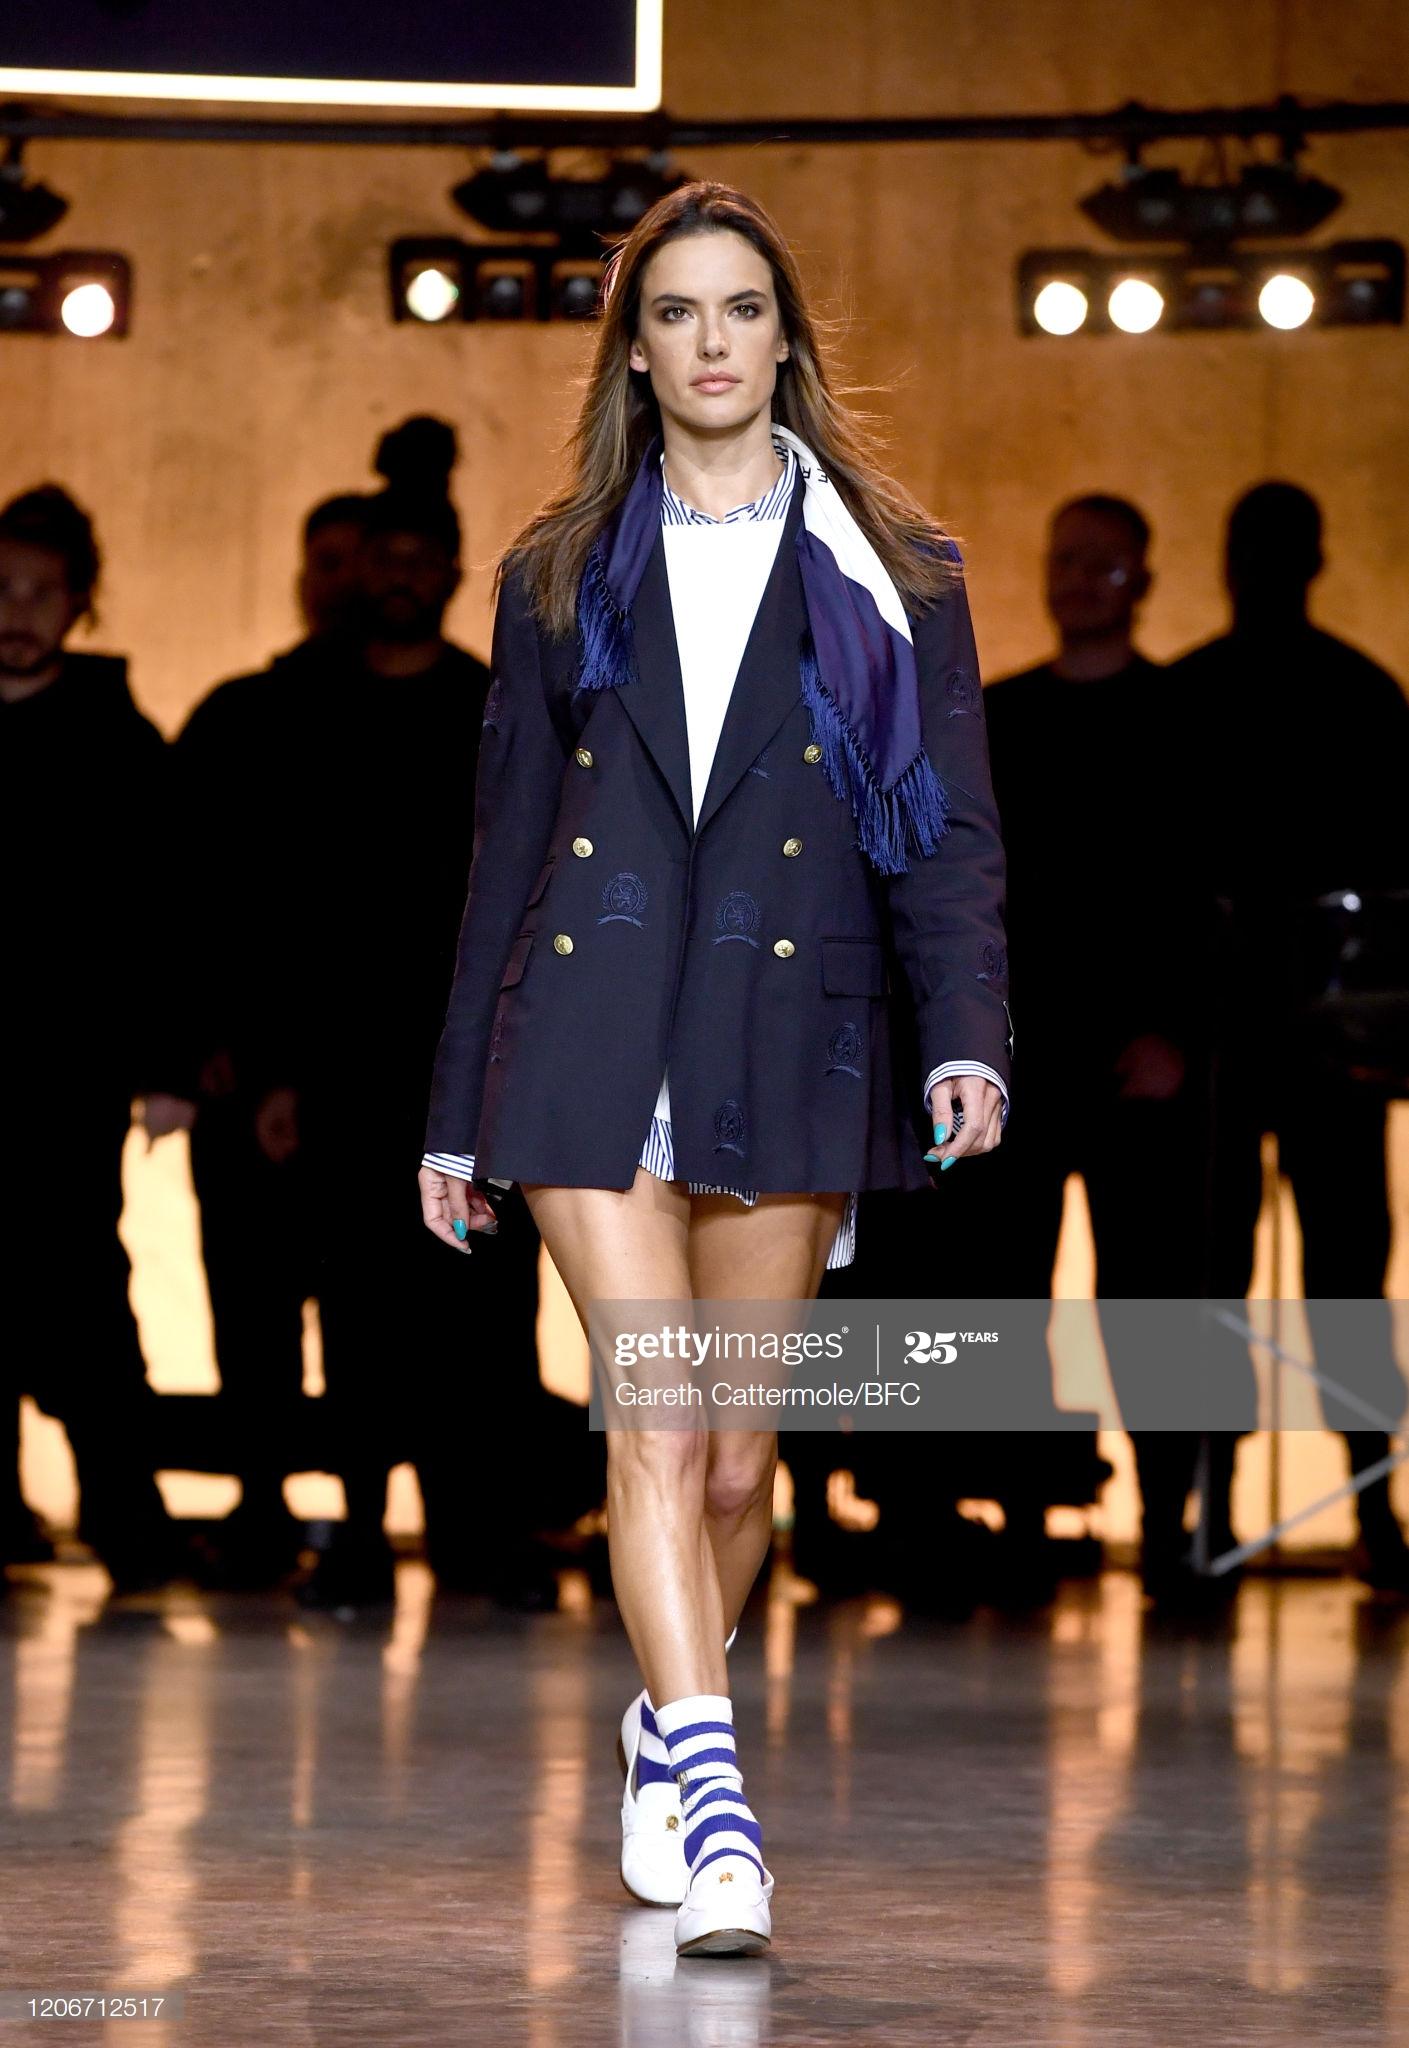 cựu thiên thần Victoria's Secret Alessandra Ambrosio tại TommyNow show London Fashion Week 2020